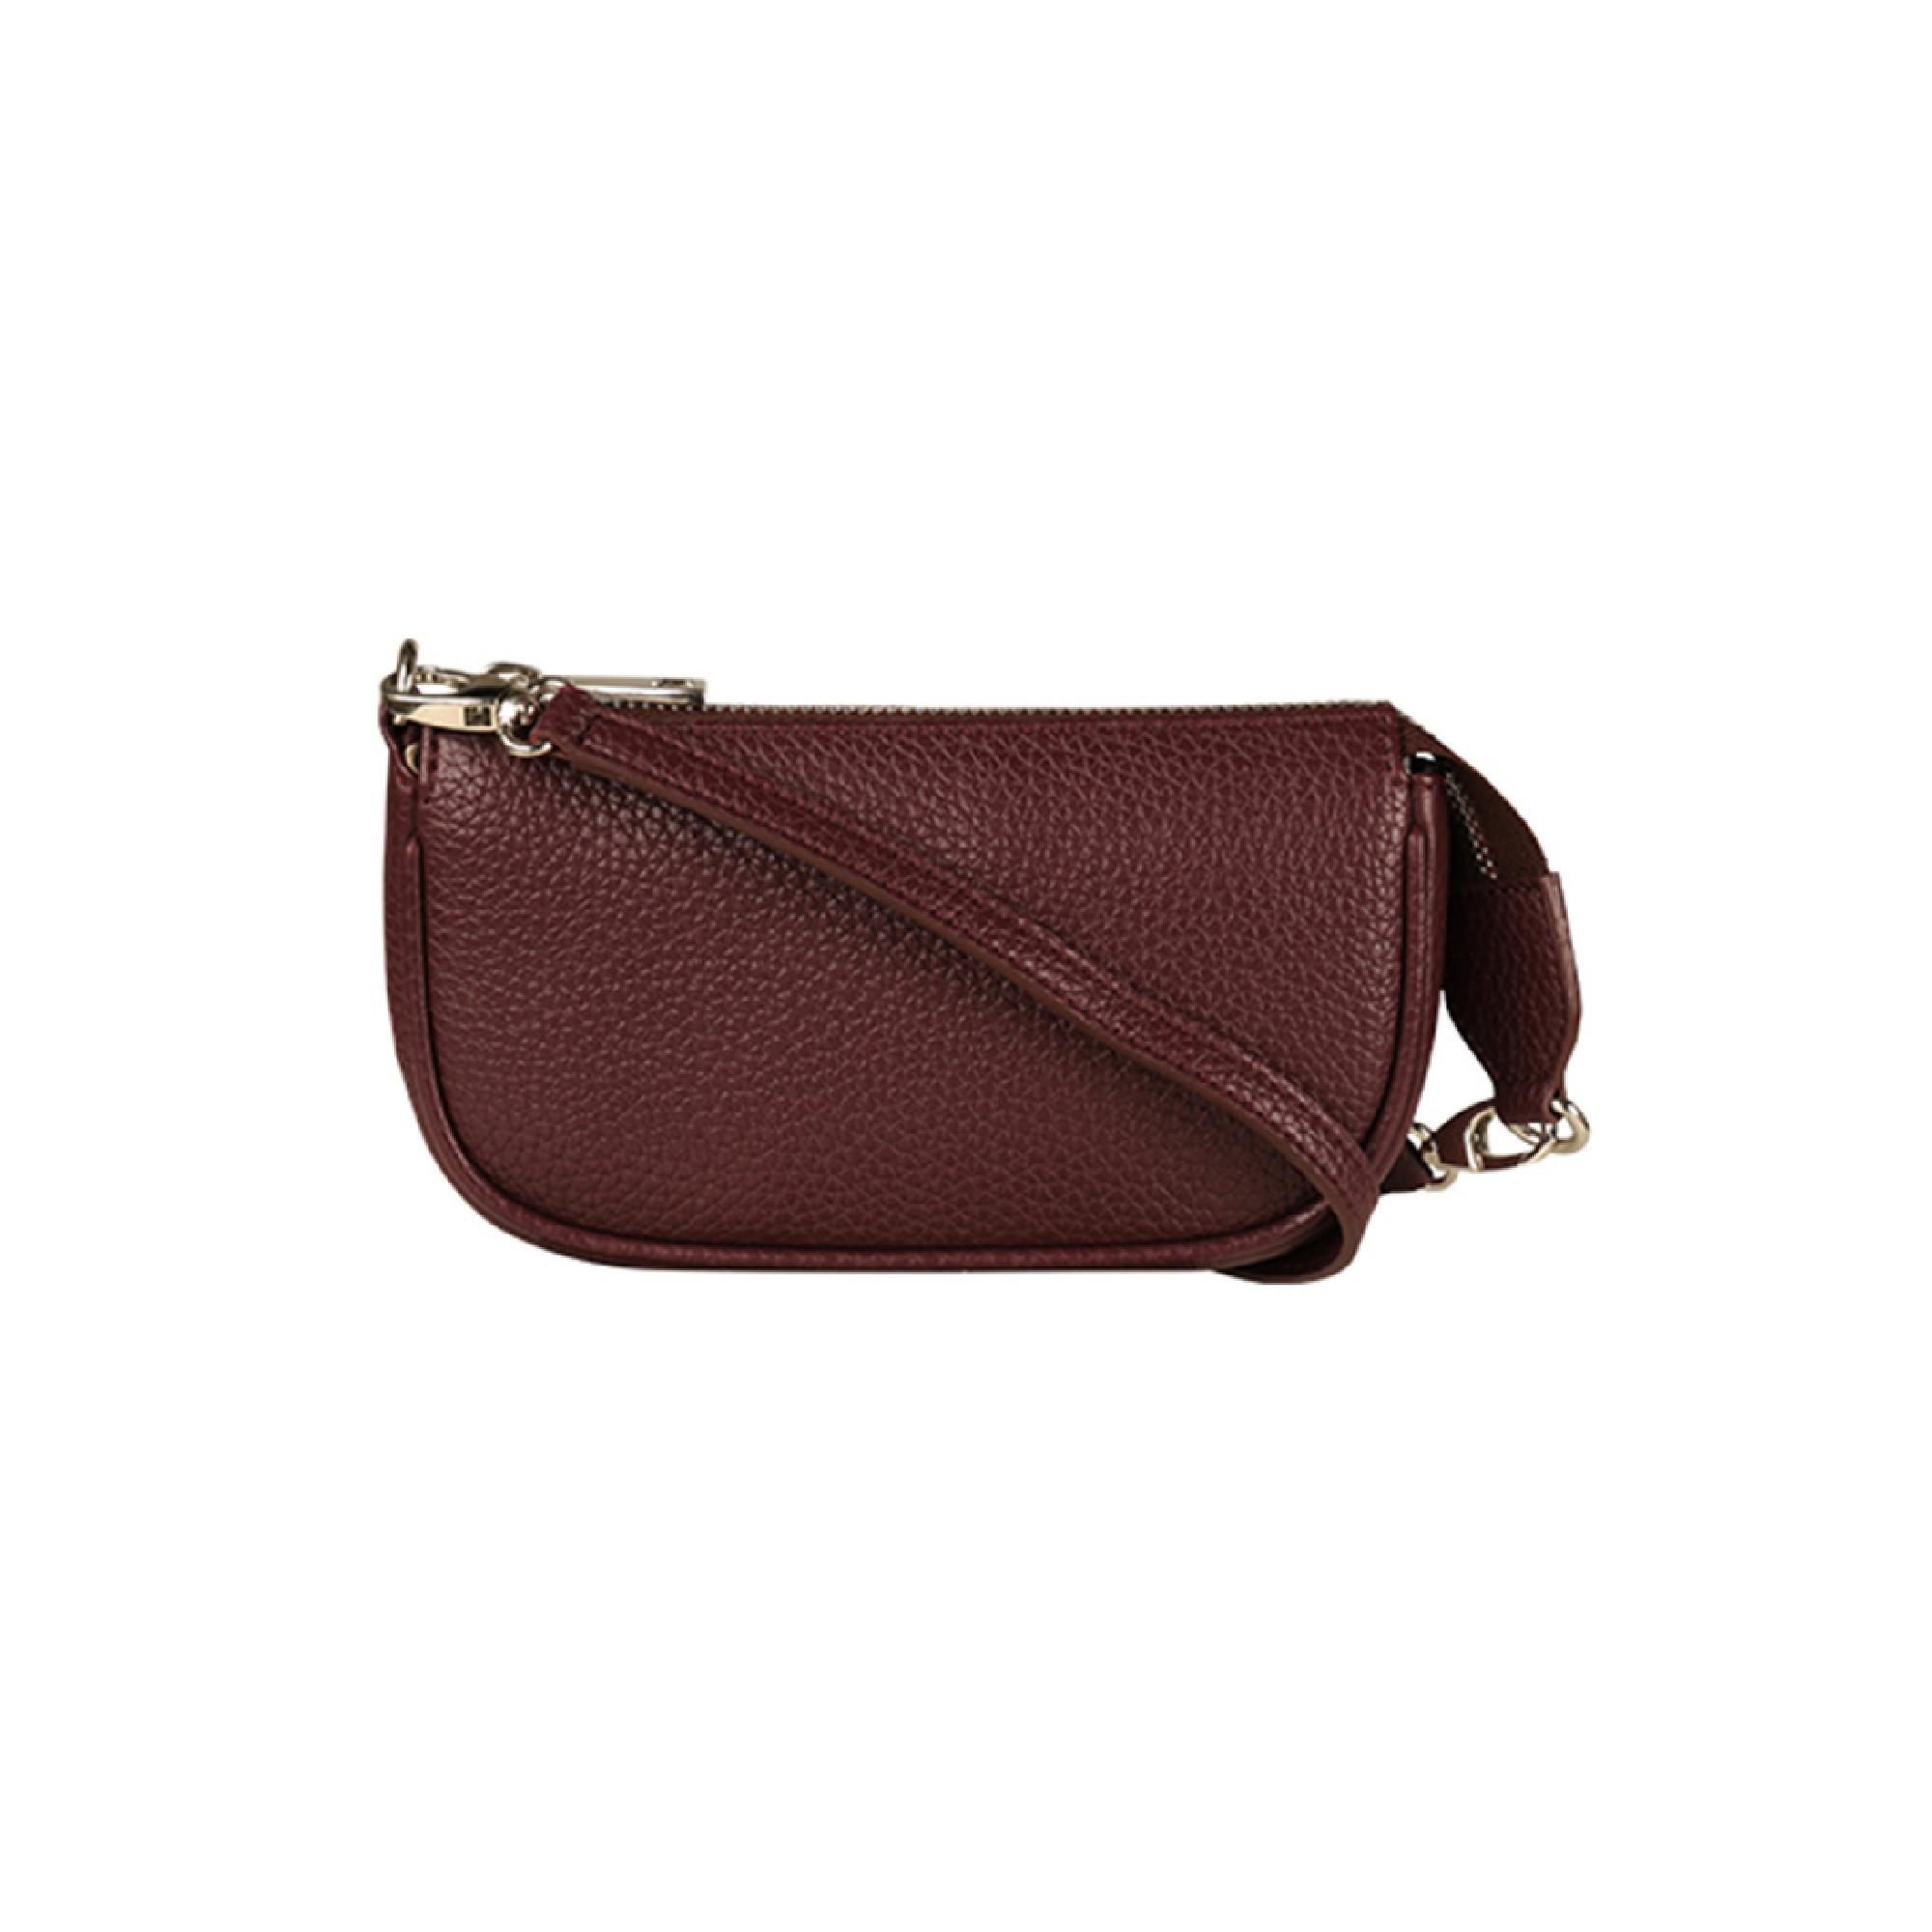 The Baby Sling Pecan Handbag